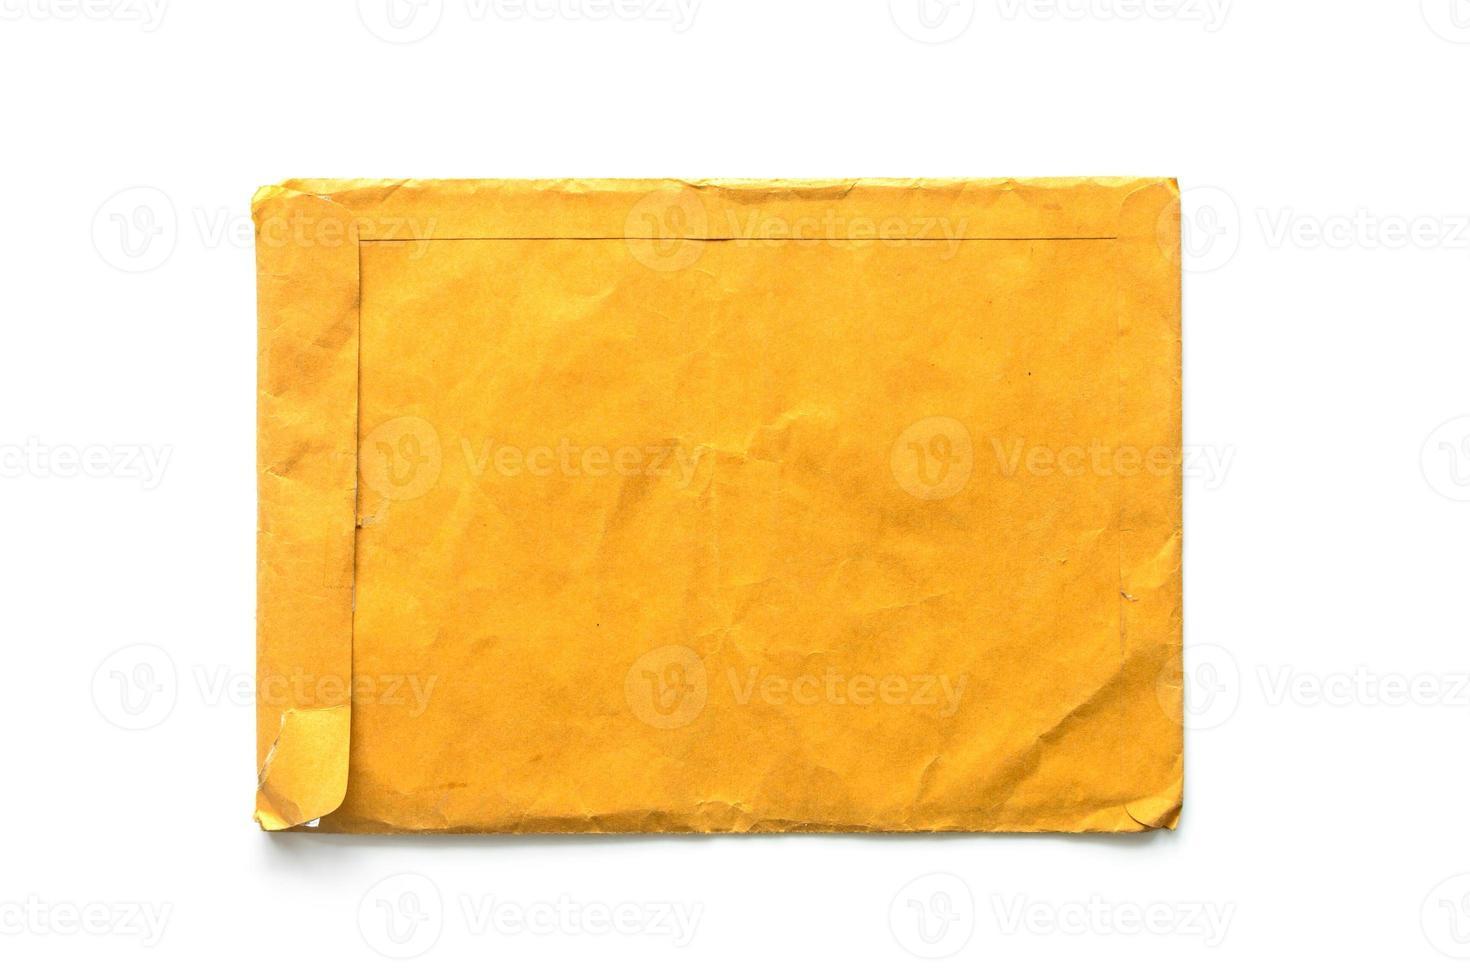 documento busta marrone su sfondo bianco foto